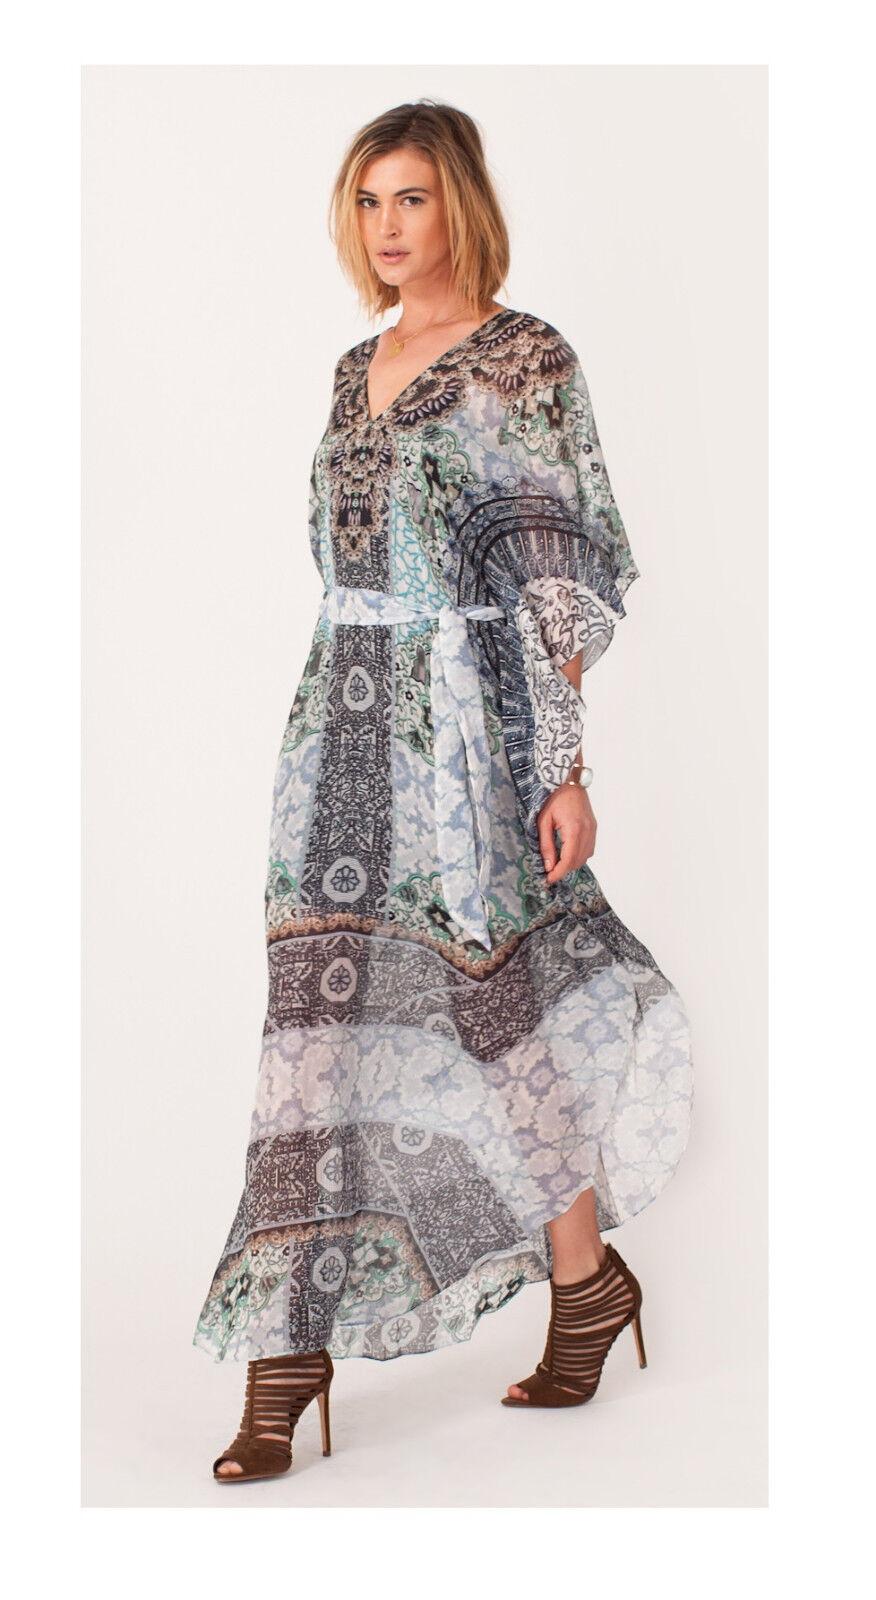 Hale Bob Women's Malika Maxi Dress - 5SAL6944